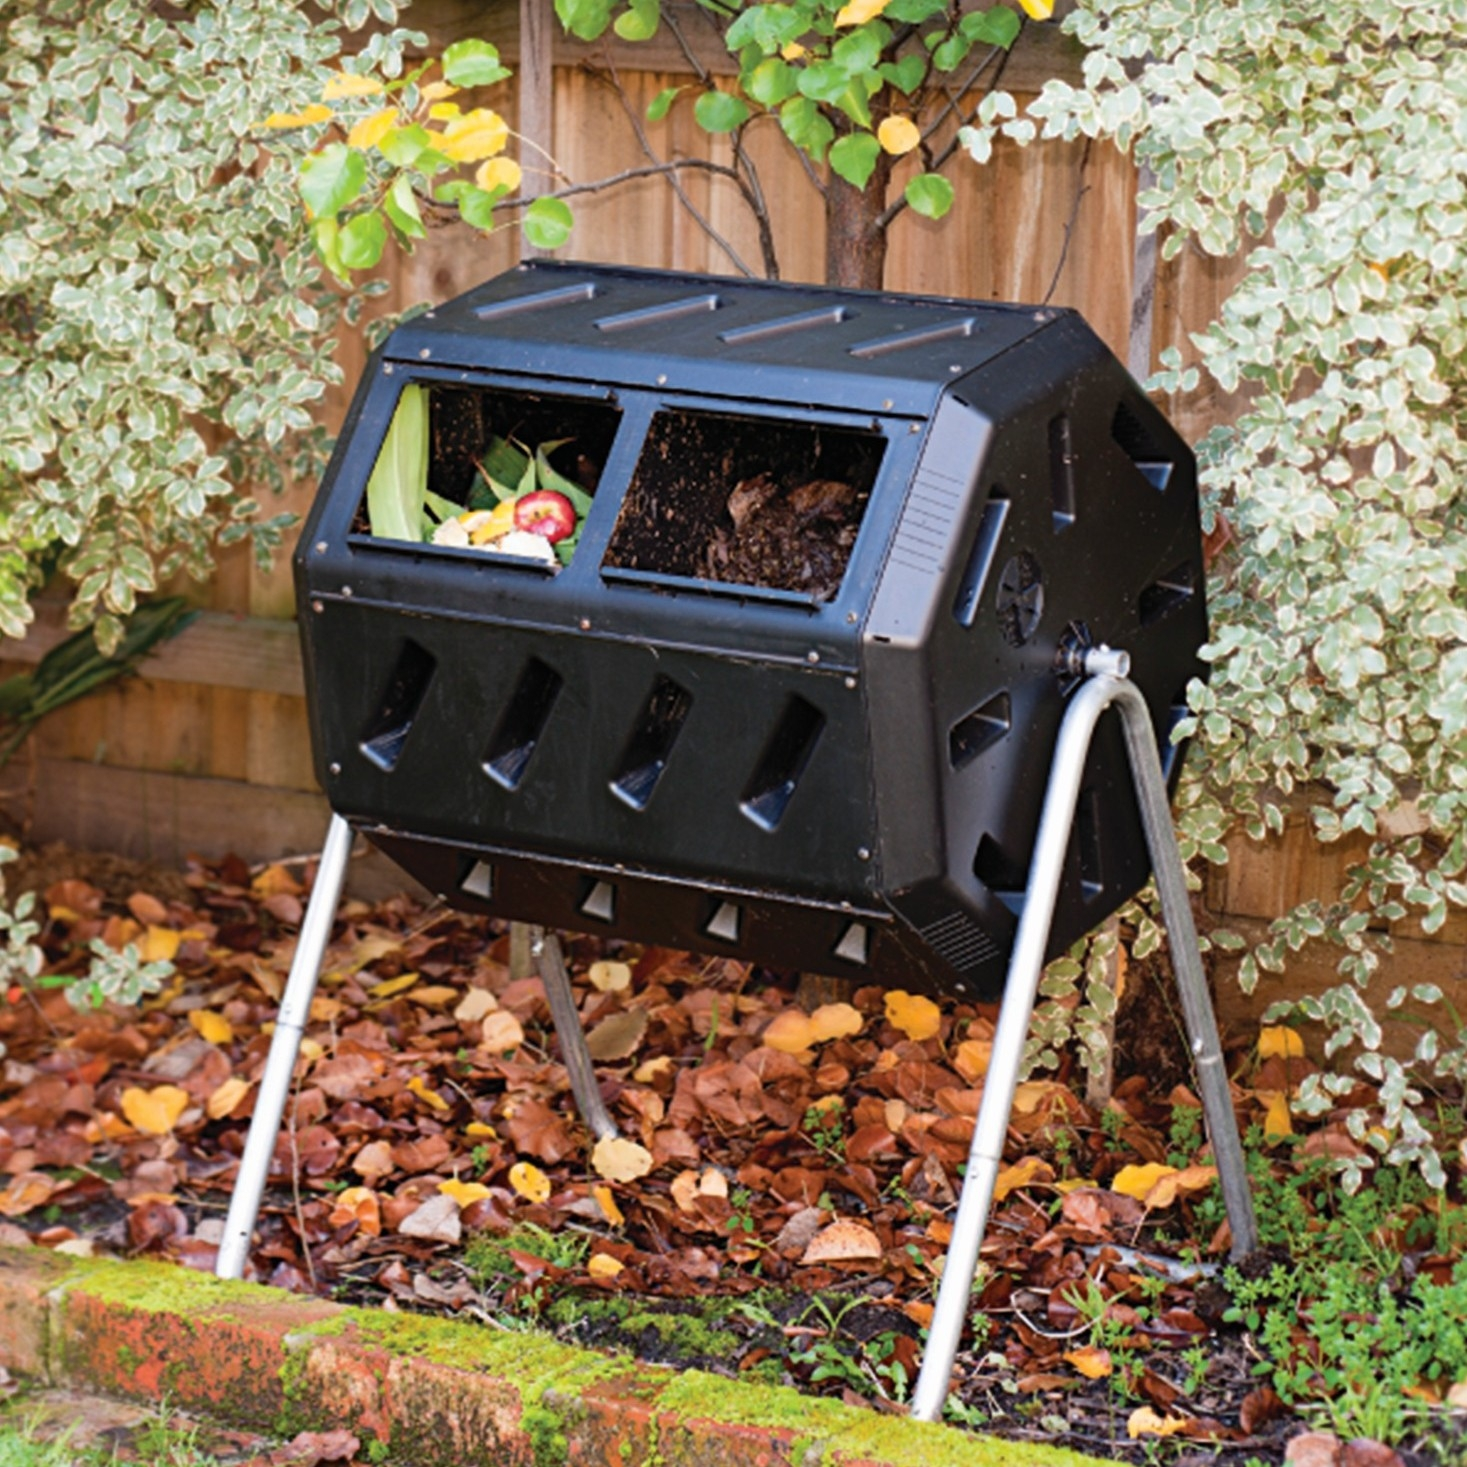 37-Gallon Tumbling Compost Bin Tumbler Composter - 5 Cu. Ft. - 37-Gallon Tumbling Compost Bin Tumbler Composter - 5 Cu. Ft